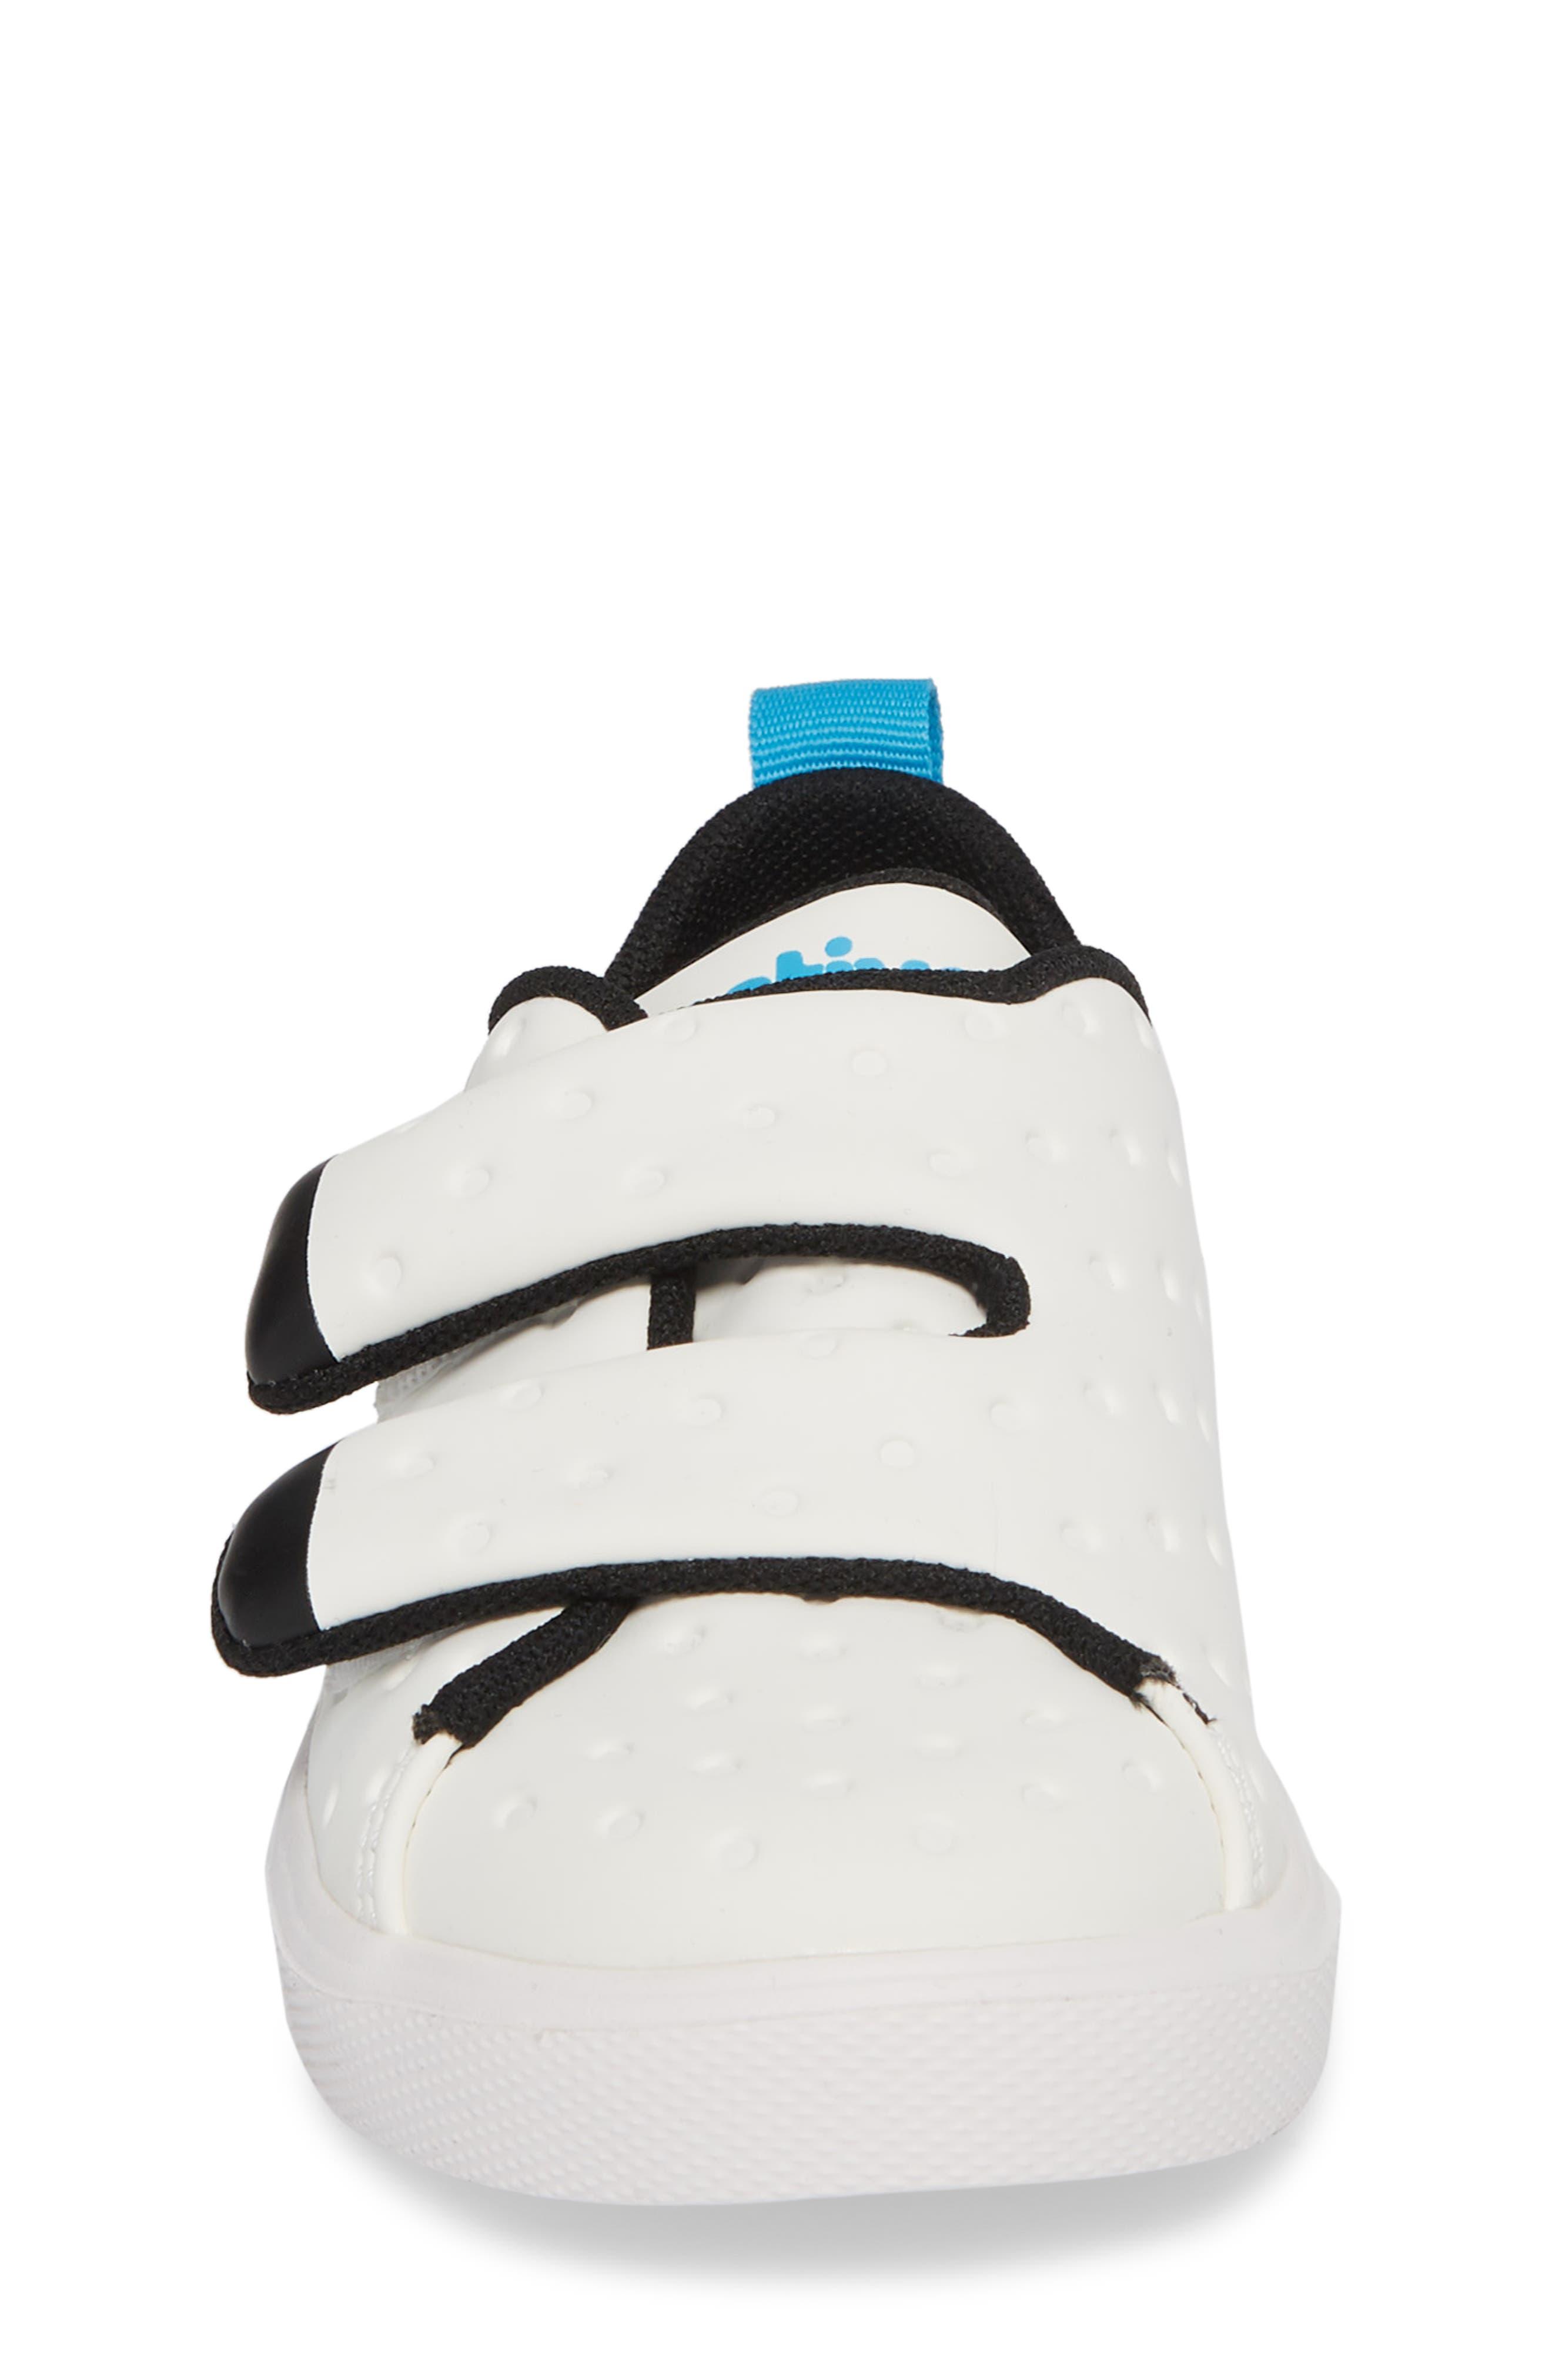 Monaco Sneaker,                             Alternate thumbnail 4, color,                             SHELL WHITE/ JIFFY BLACK